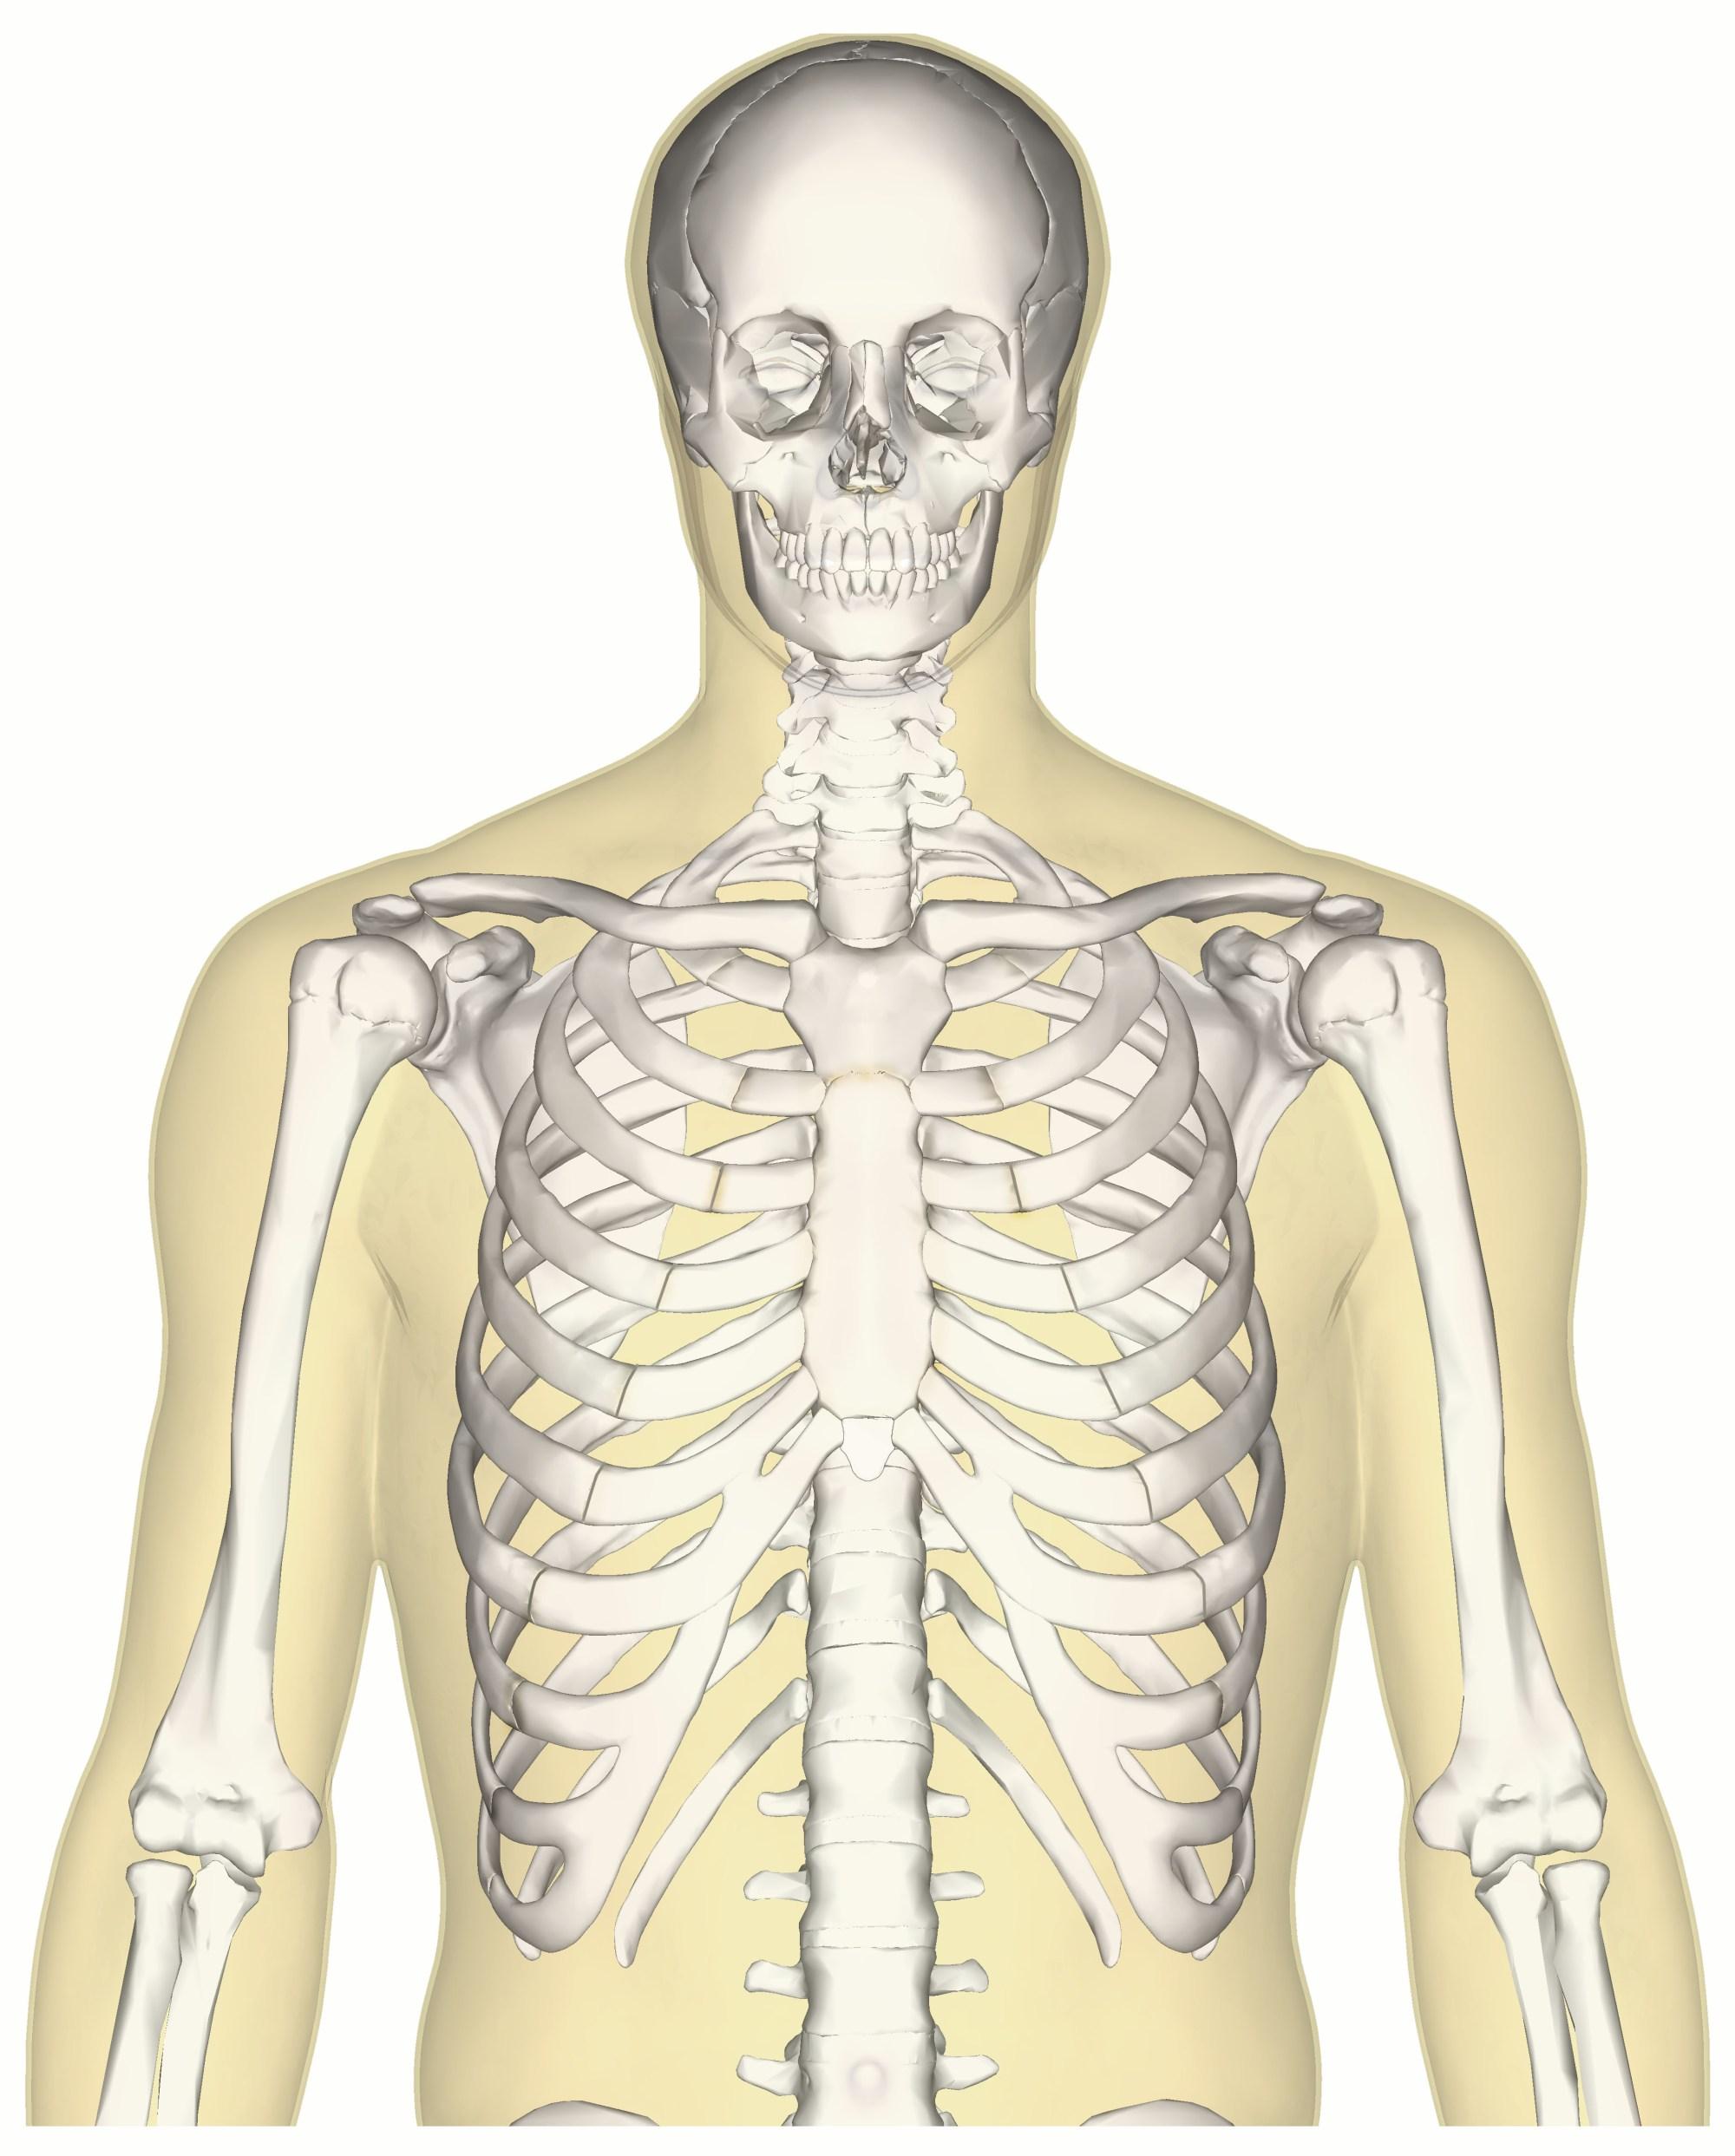 hight resolution of file human skeleton upper body anterior view jpg